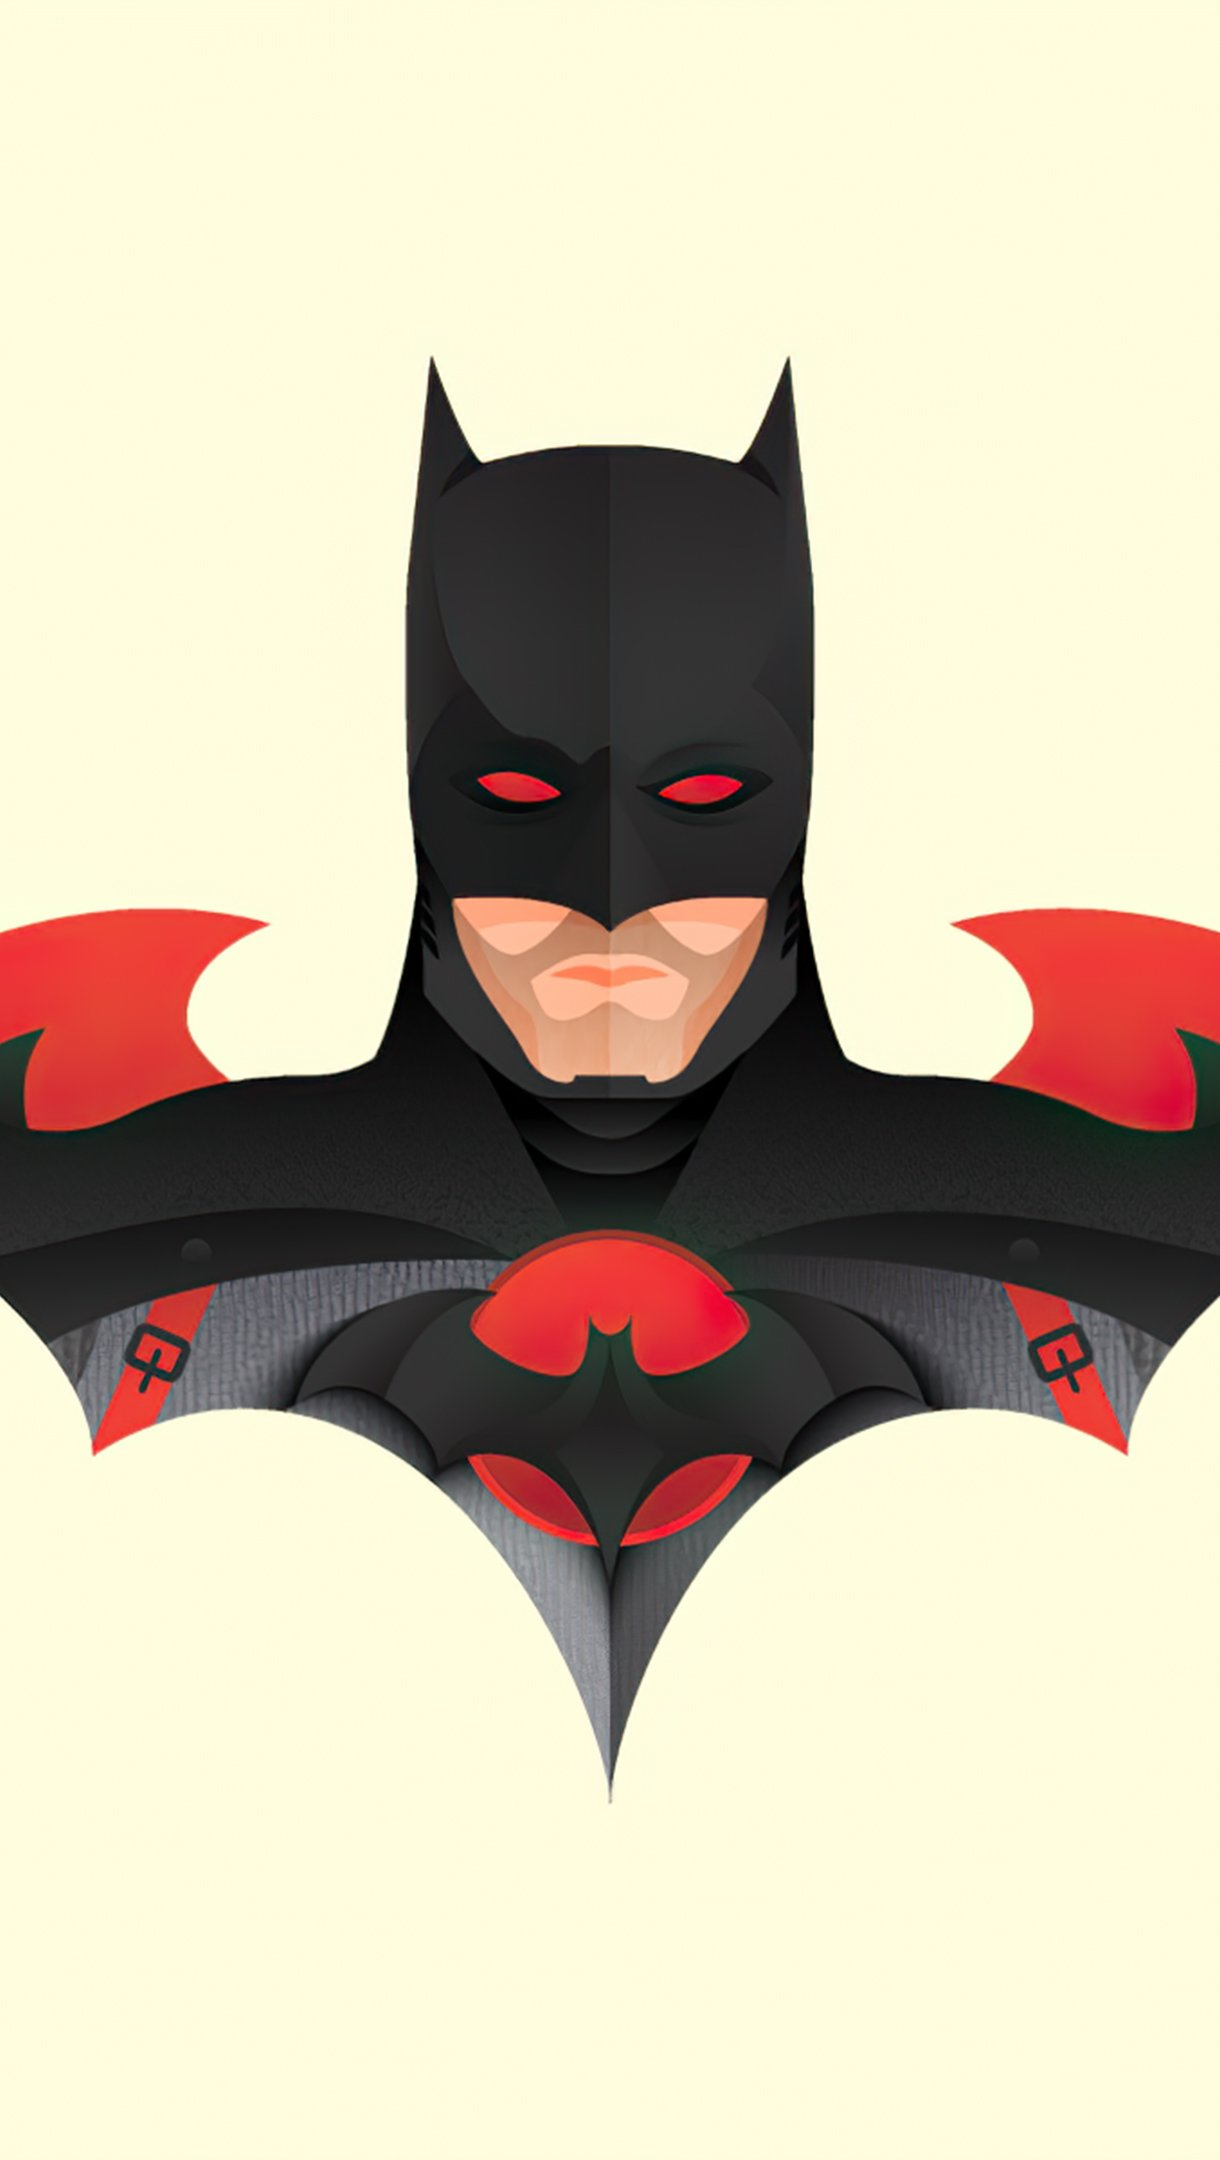 Fondos de pantalla Ilustracion Minimalista de Batman Vertical